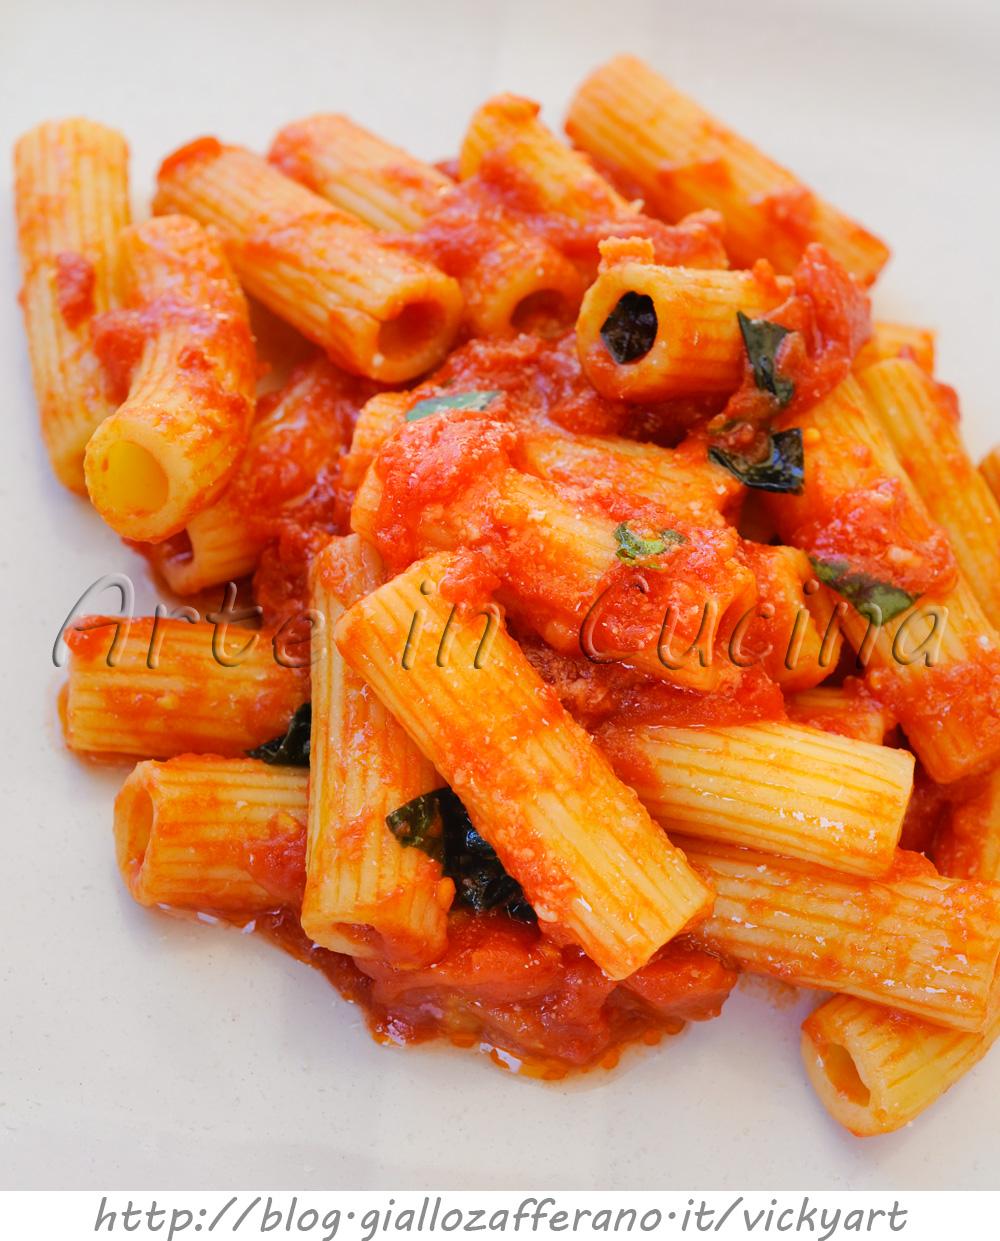 Maccheroni alla napoletana ricetta veloce vickyart arte in cucina